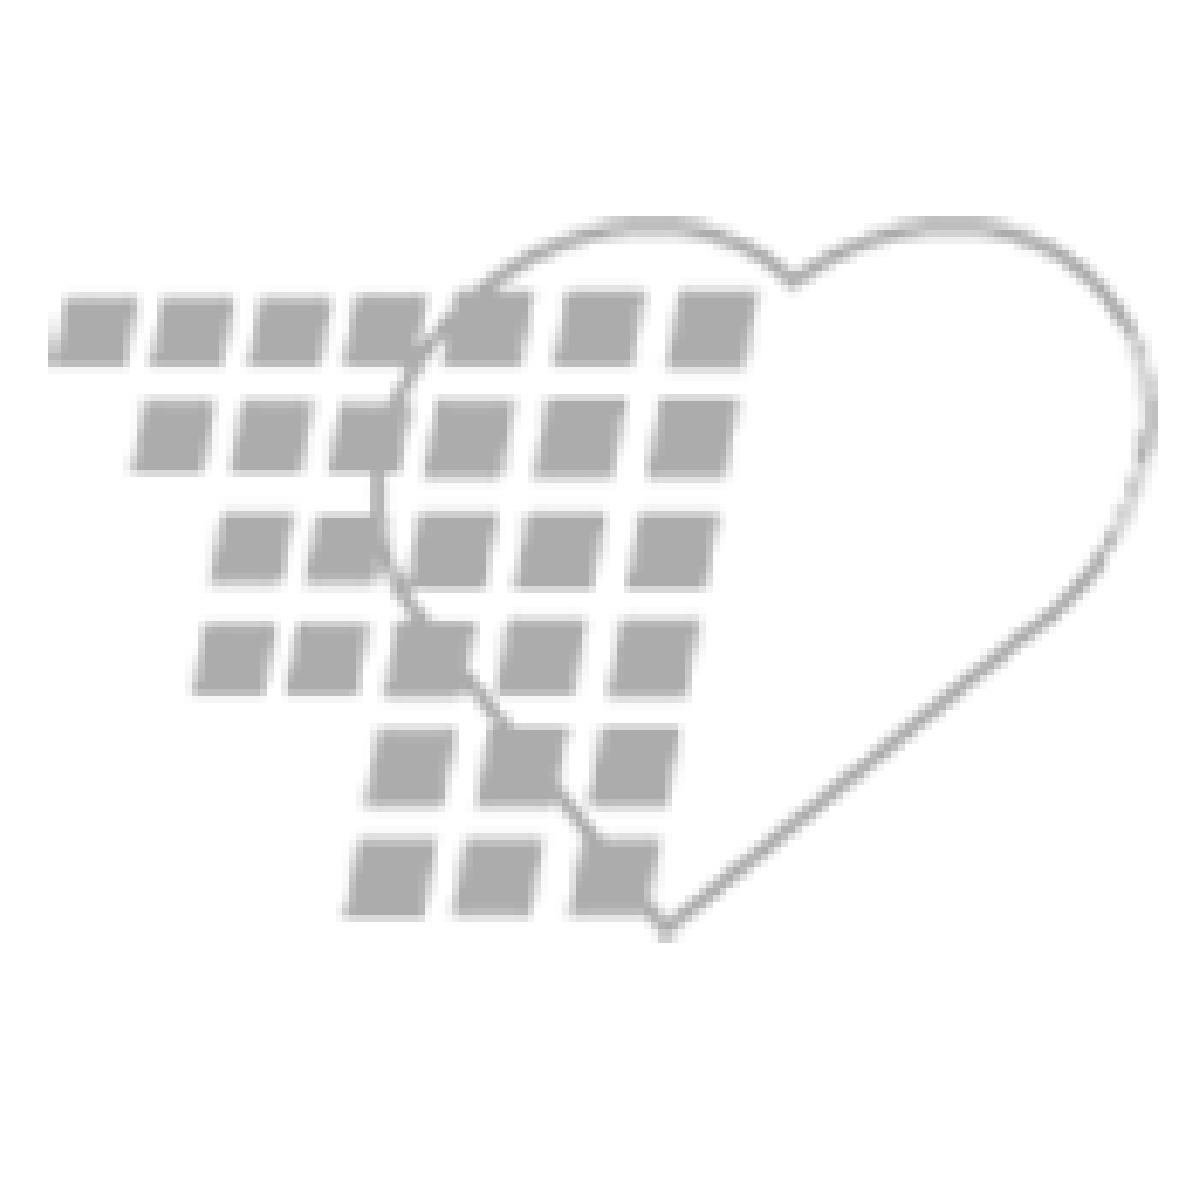 02-38-5010 - Assure® Platinum Test Strips